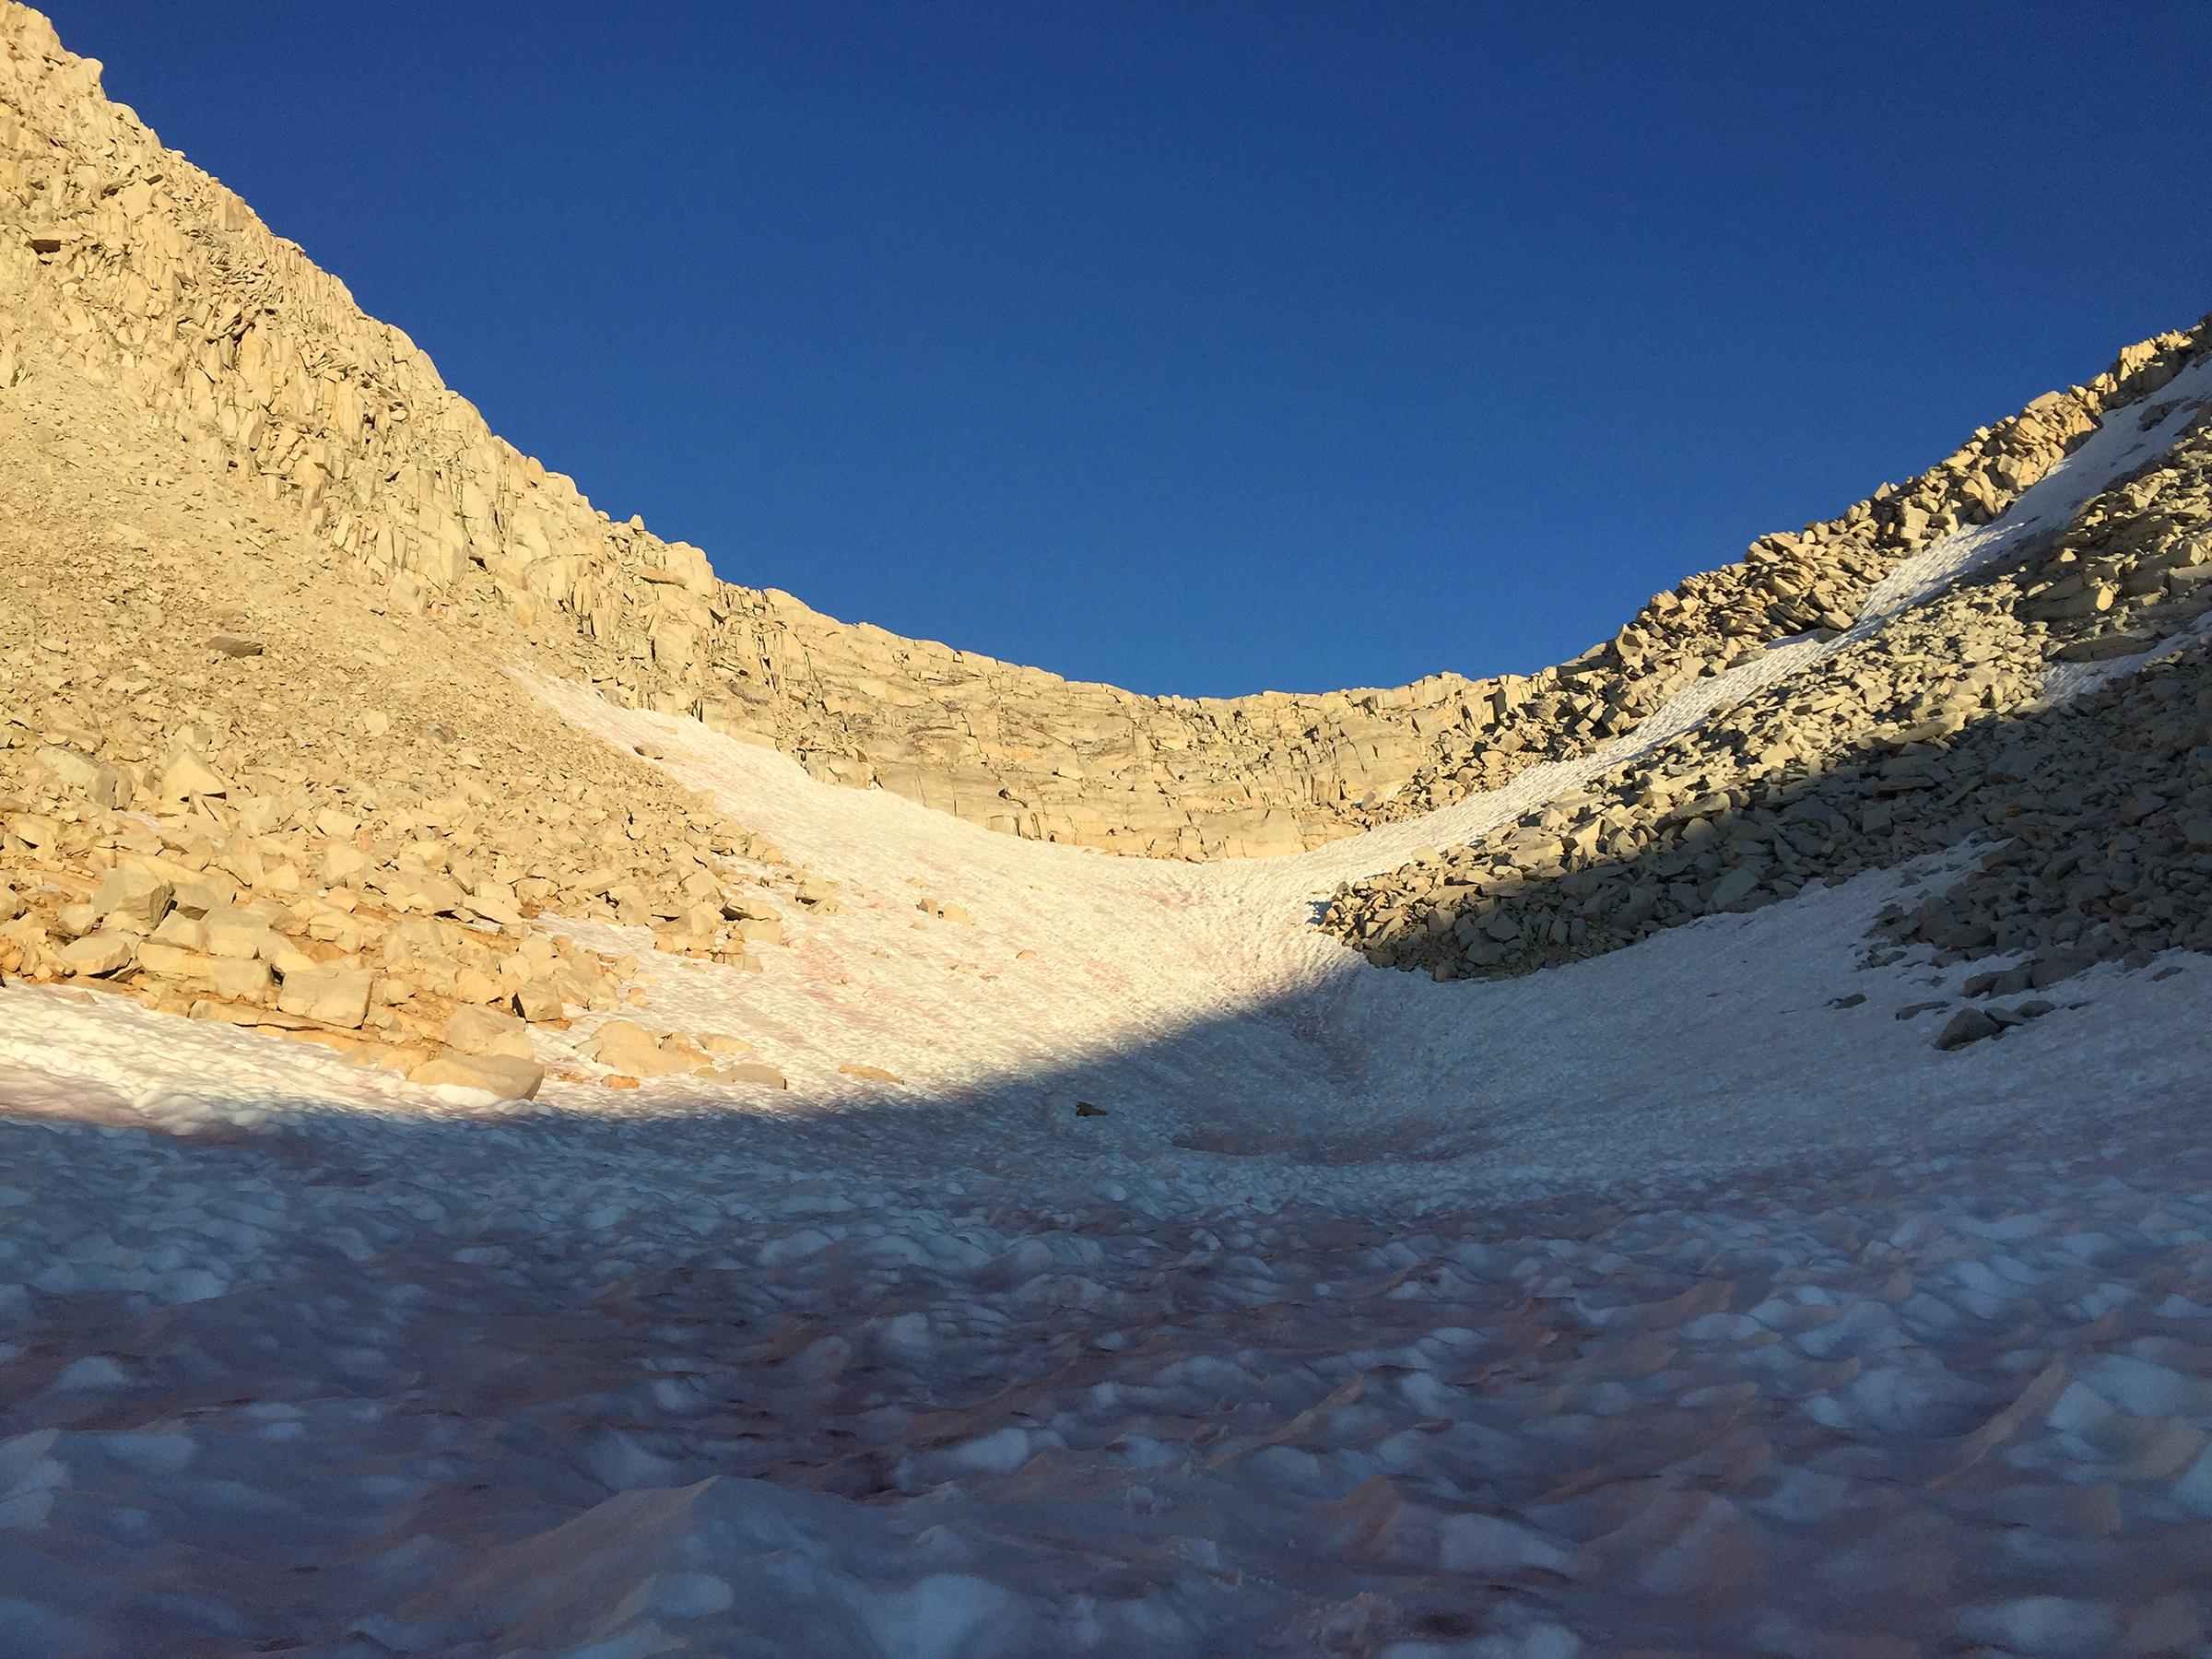 trailname-backstroke-sierra-high-route-2017_0699.jpg